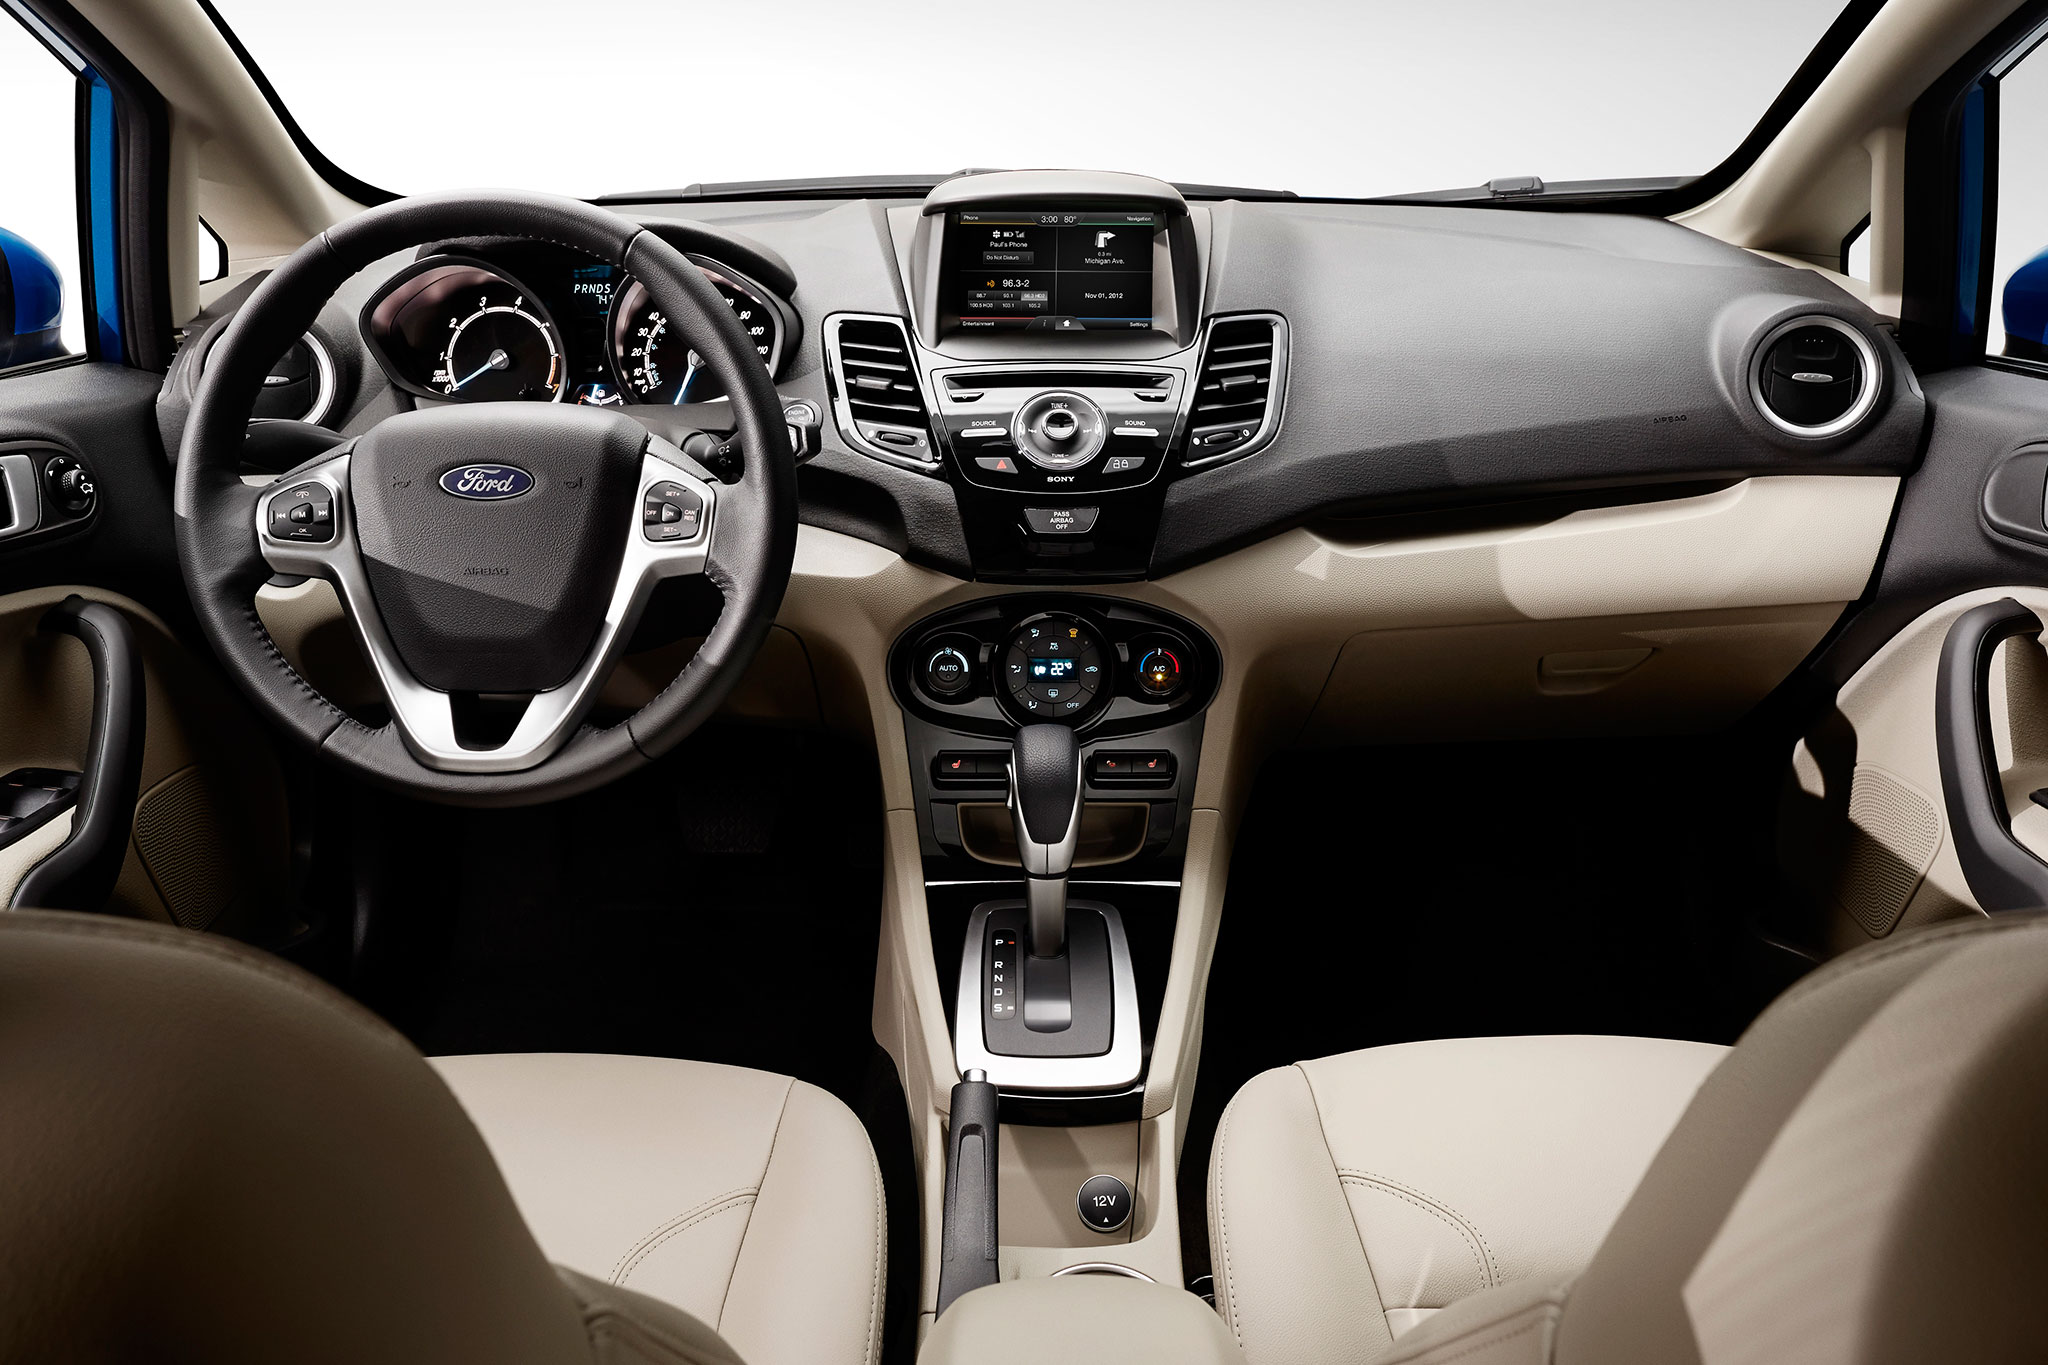 2014 Ford Fiesta. 13|250